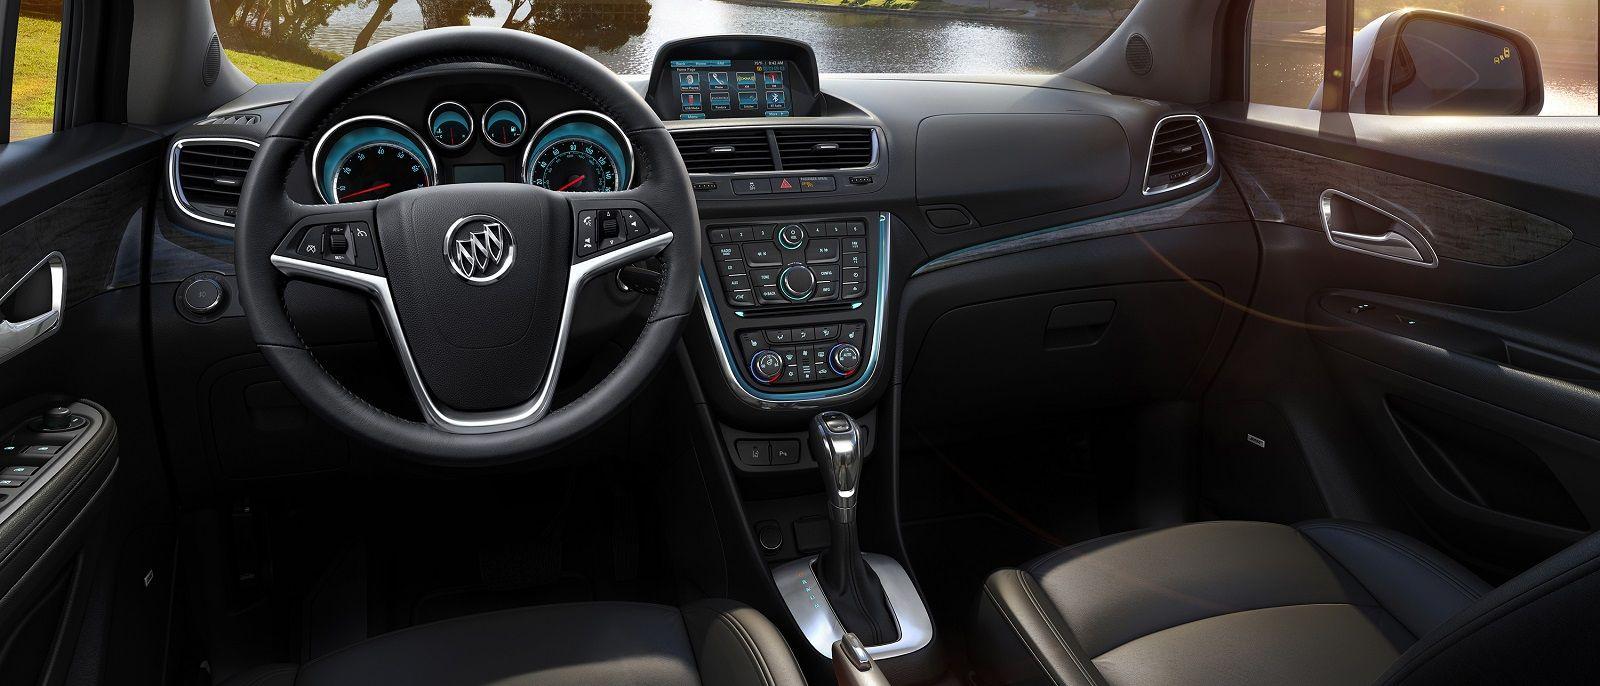 2016 Buick Encore Interior